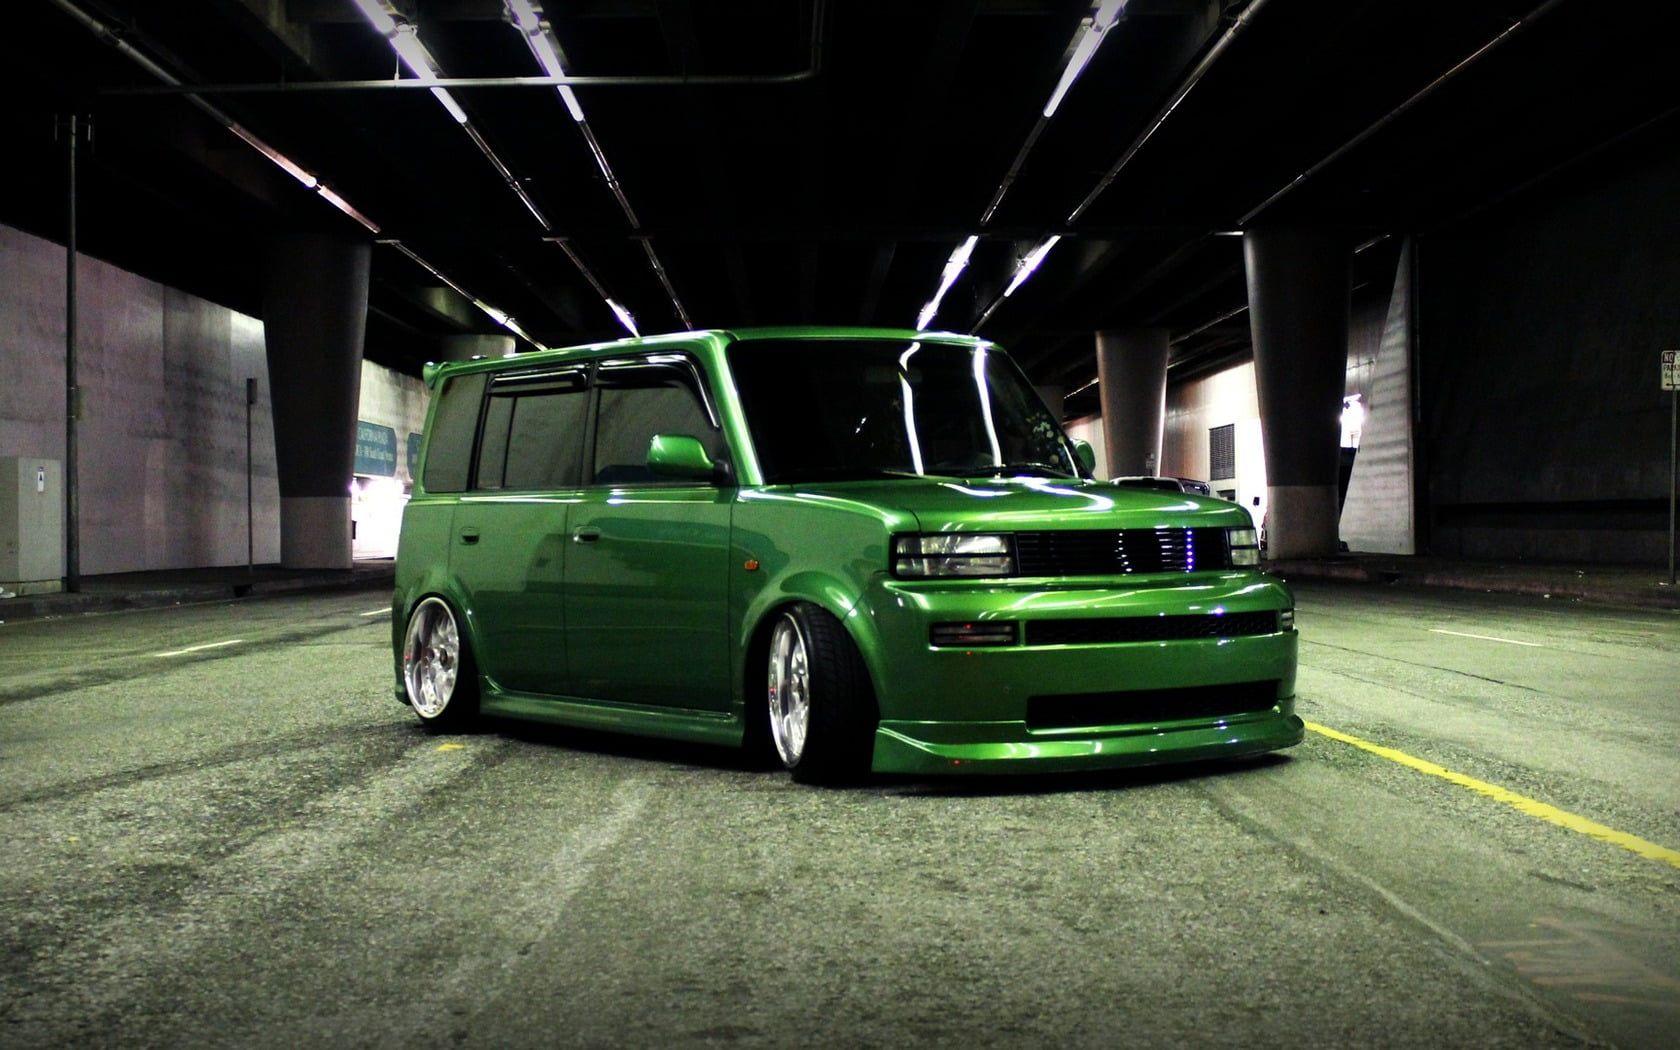 Scion XB Green, green 5-door hatchback #Cars #Scion #green ...